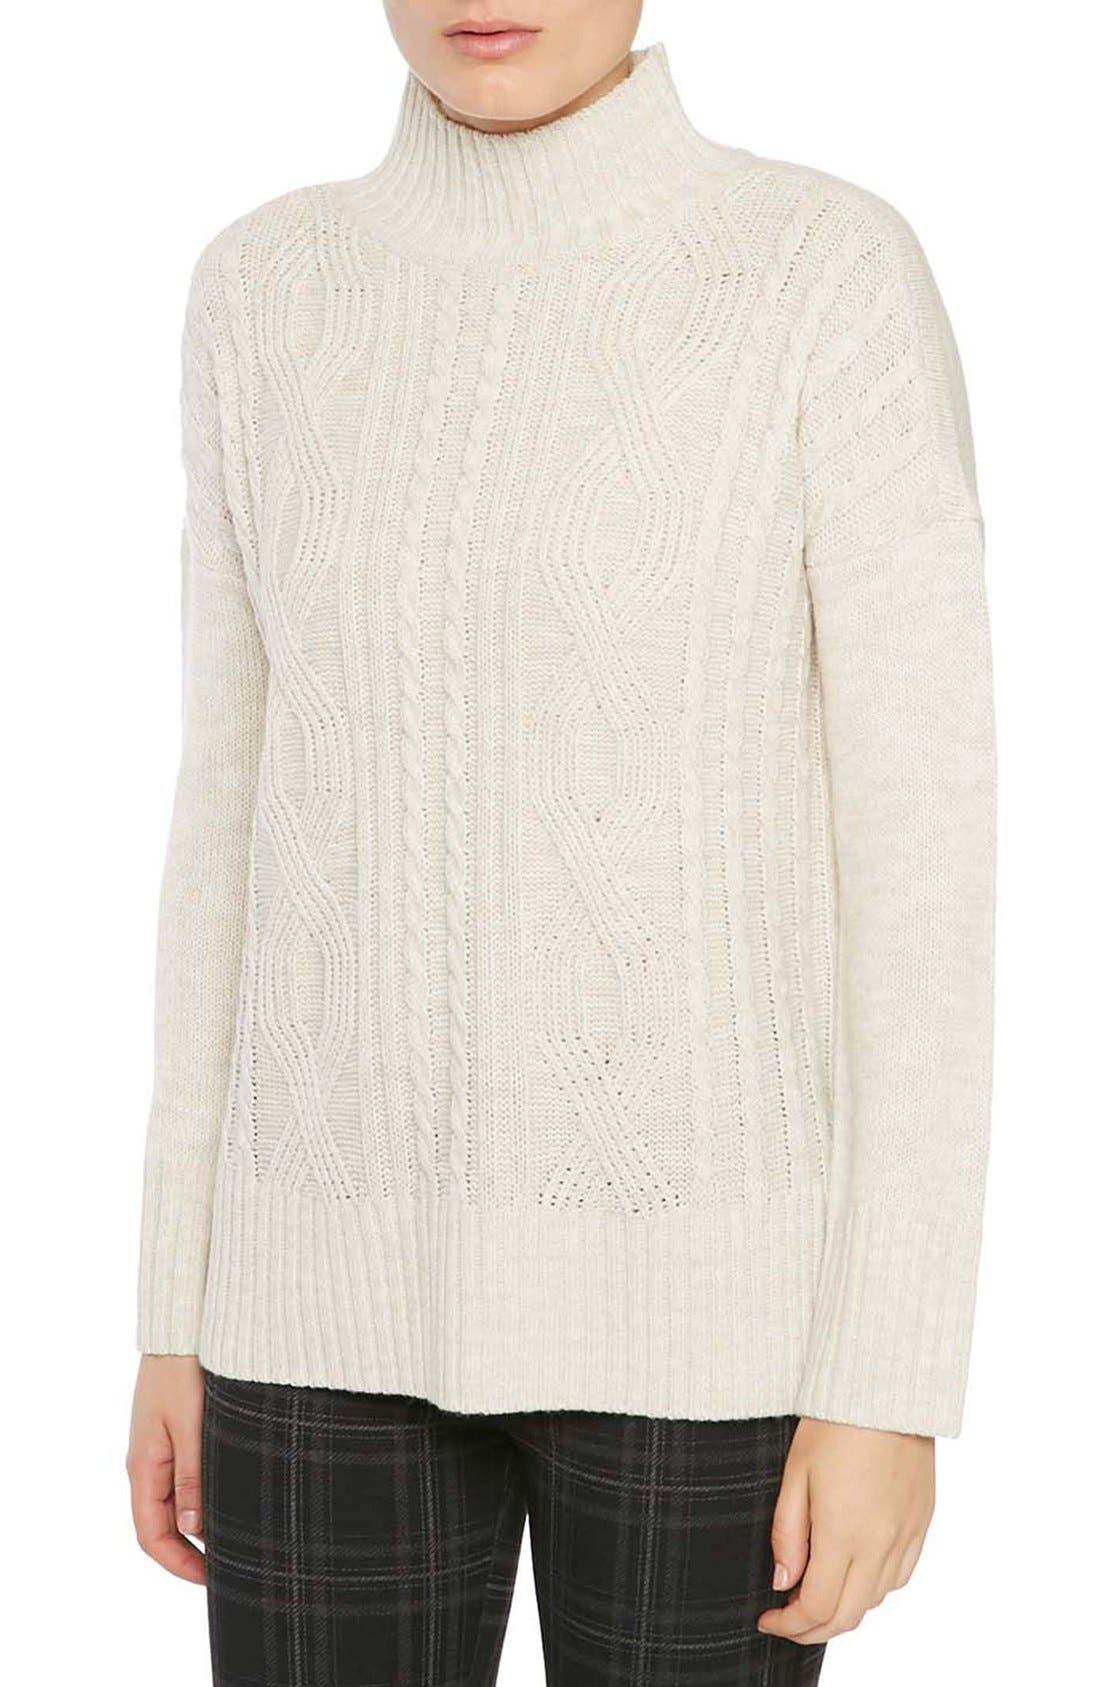 Alternate Image 1 Selected - Sanctuary The Wonderer Mock Neck Sweater